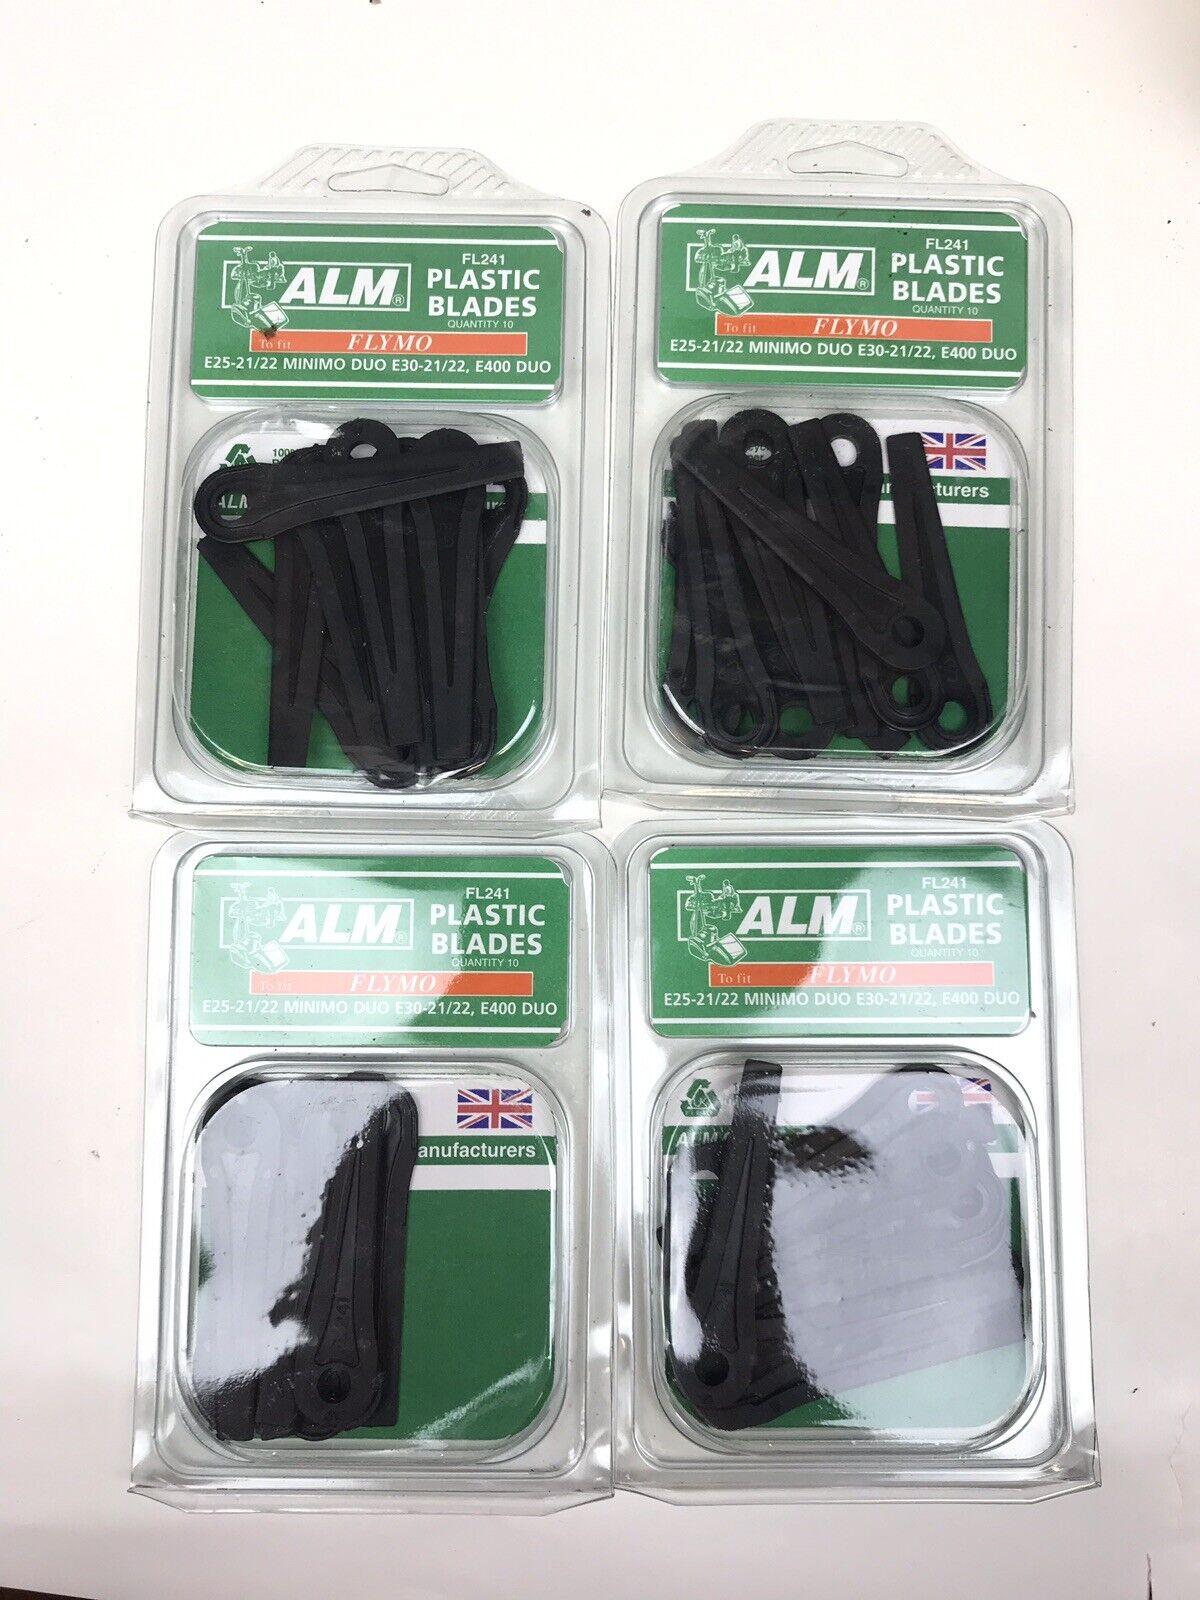 ALM FL241 6 x clip on plastic mower blades for lawnmowers like flymo